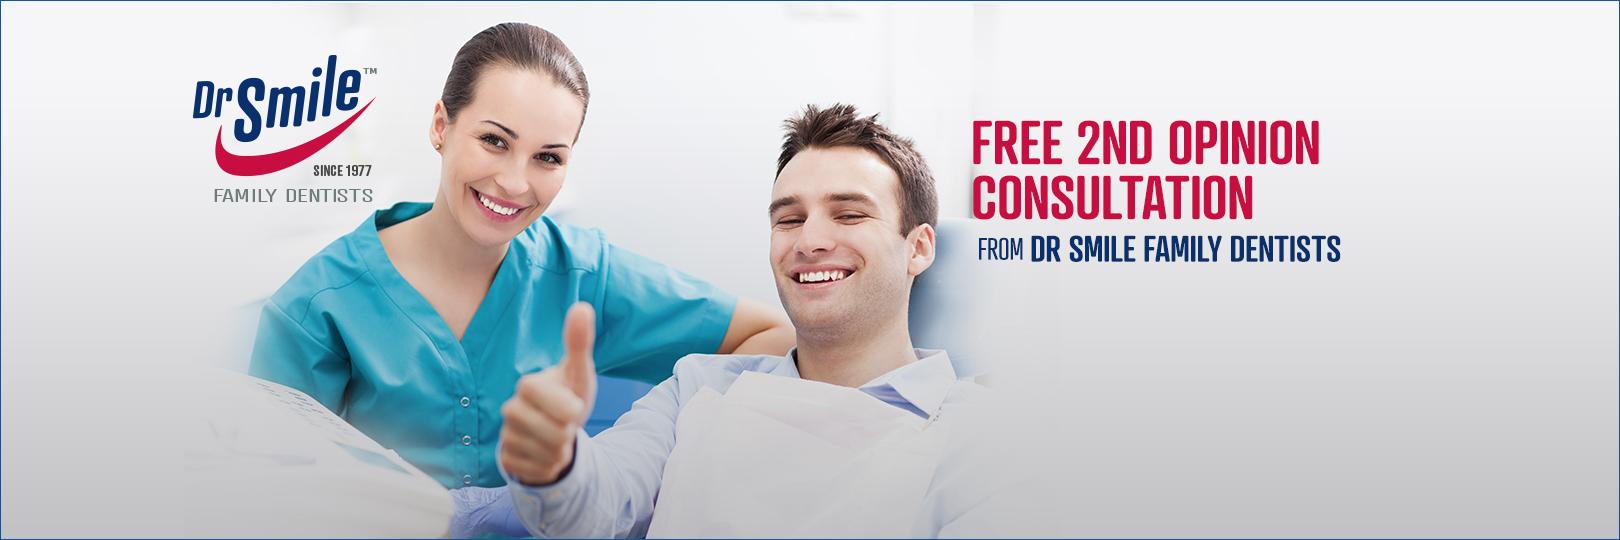 DrSmile-Banner-Consultation